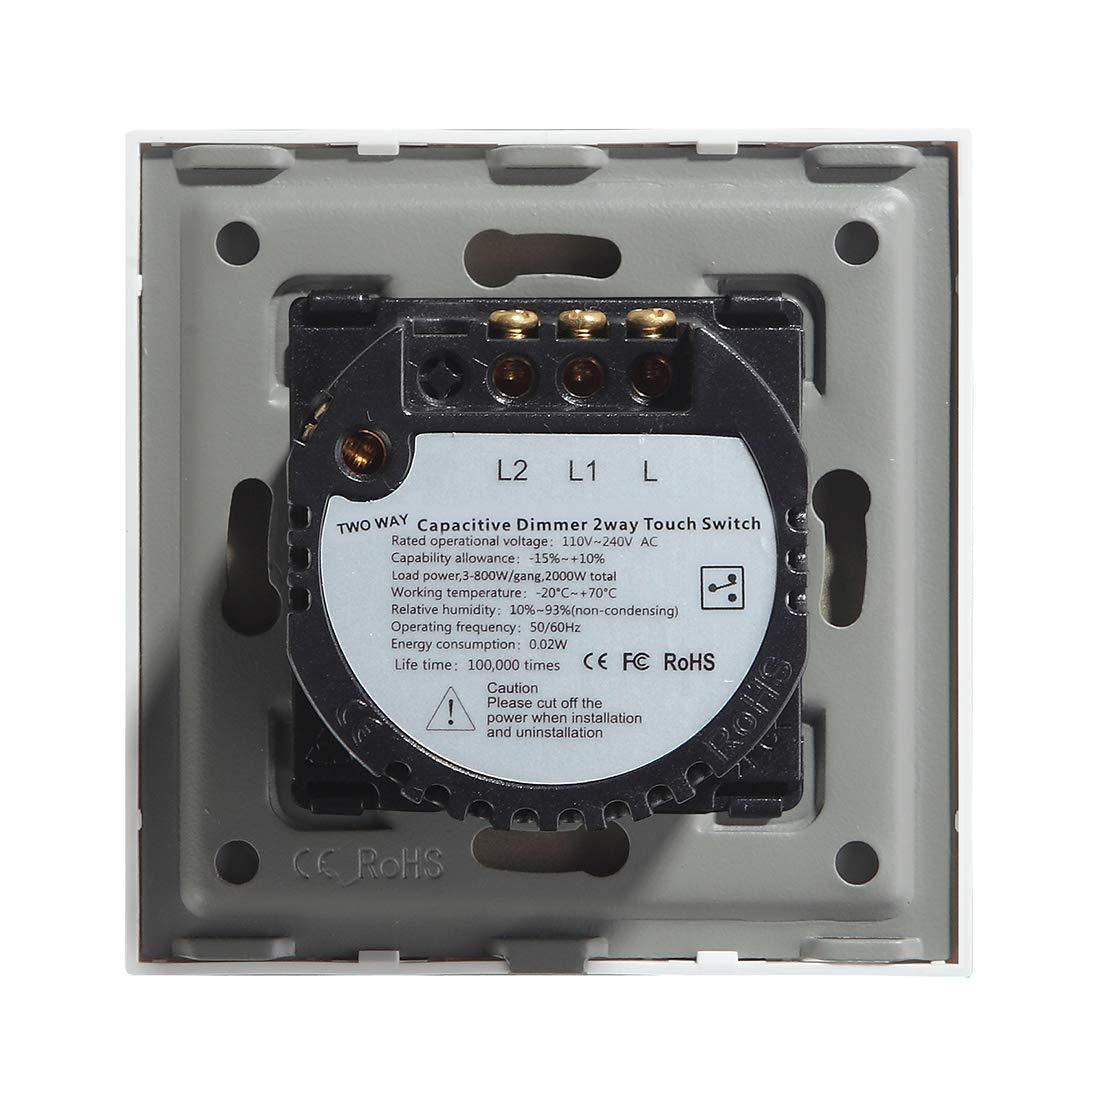 BSEED Interruptor de pared t/áctil de 86 mm Panel de vidrio InterruptorTemplado inteligentes 1 Gang 1 Way 110V 250V Black